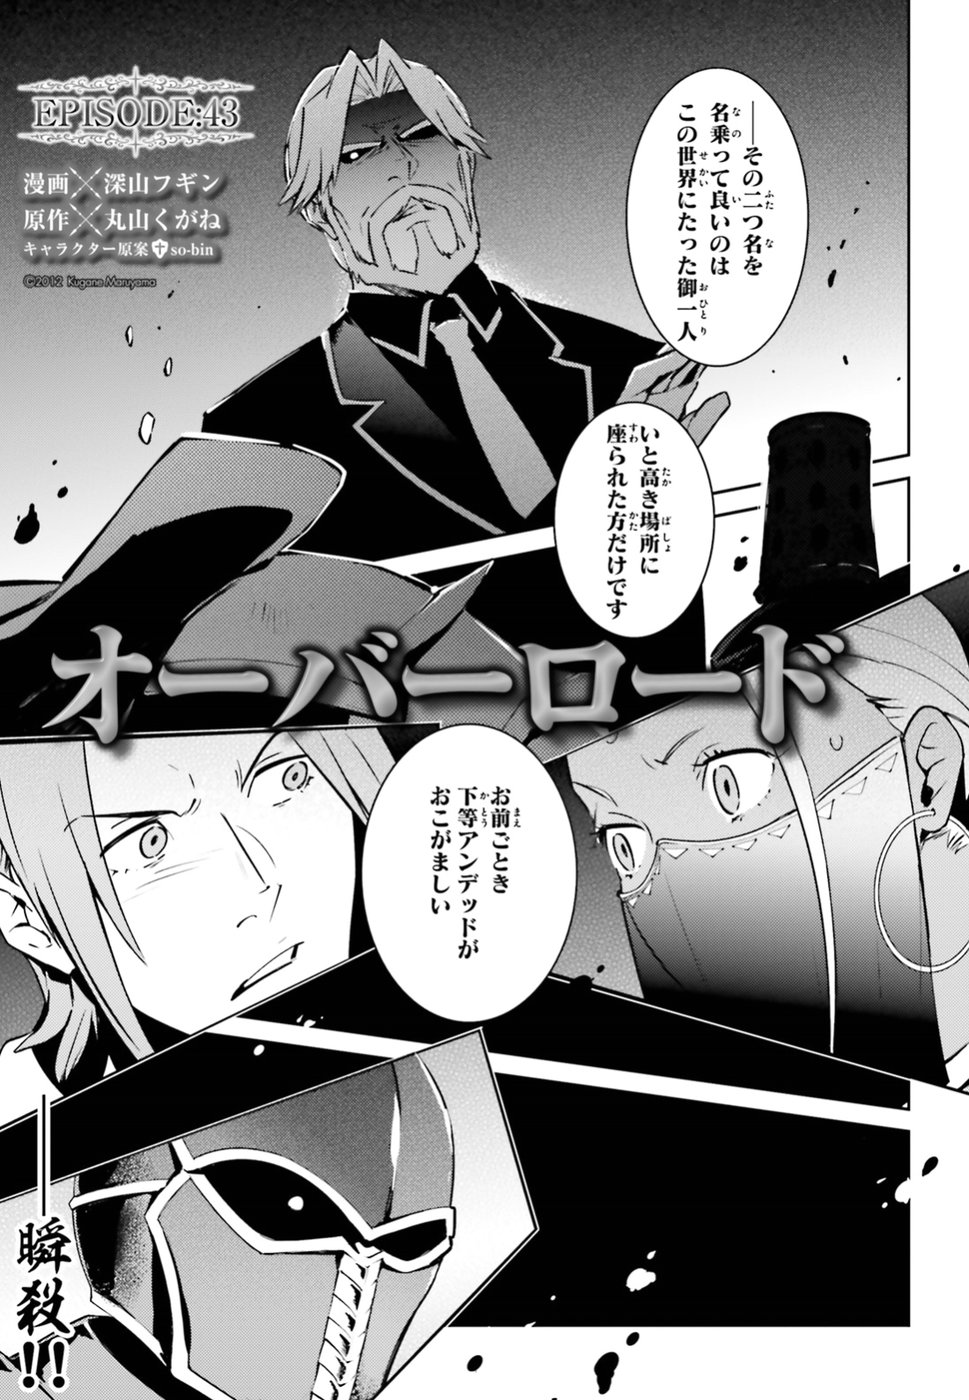 Overlord Manga Chapter 43